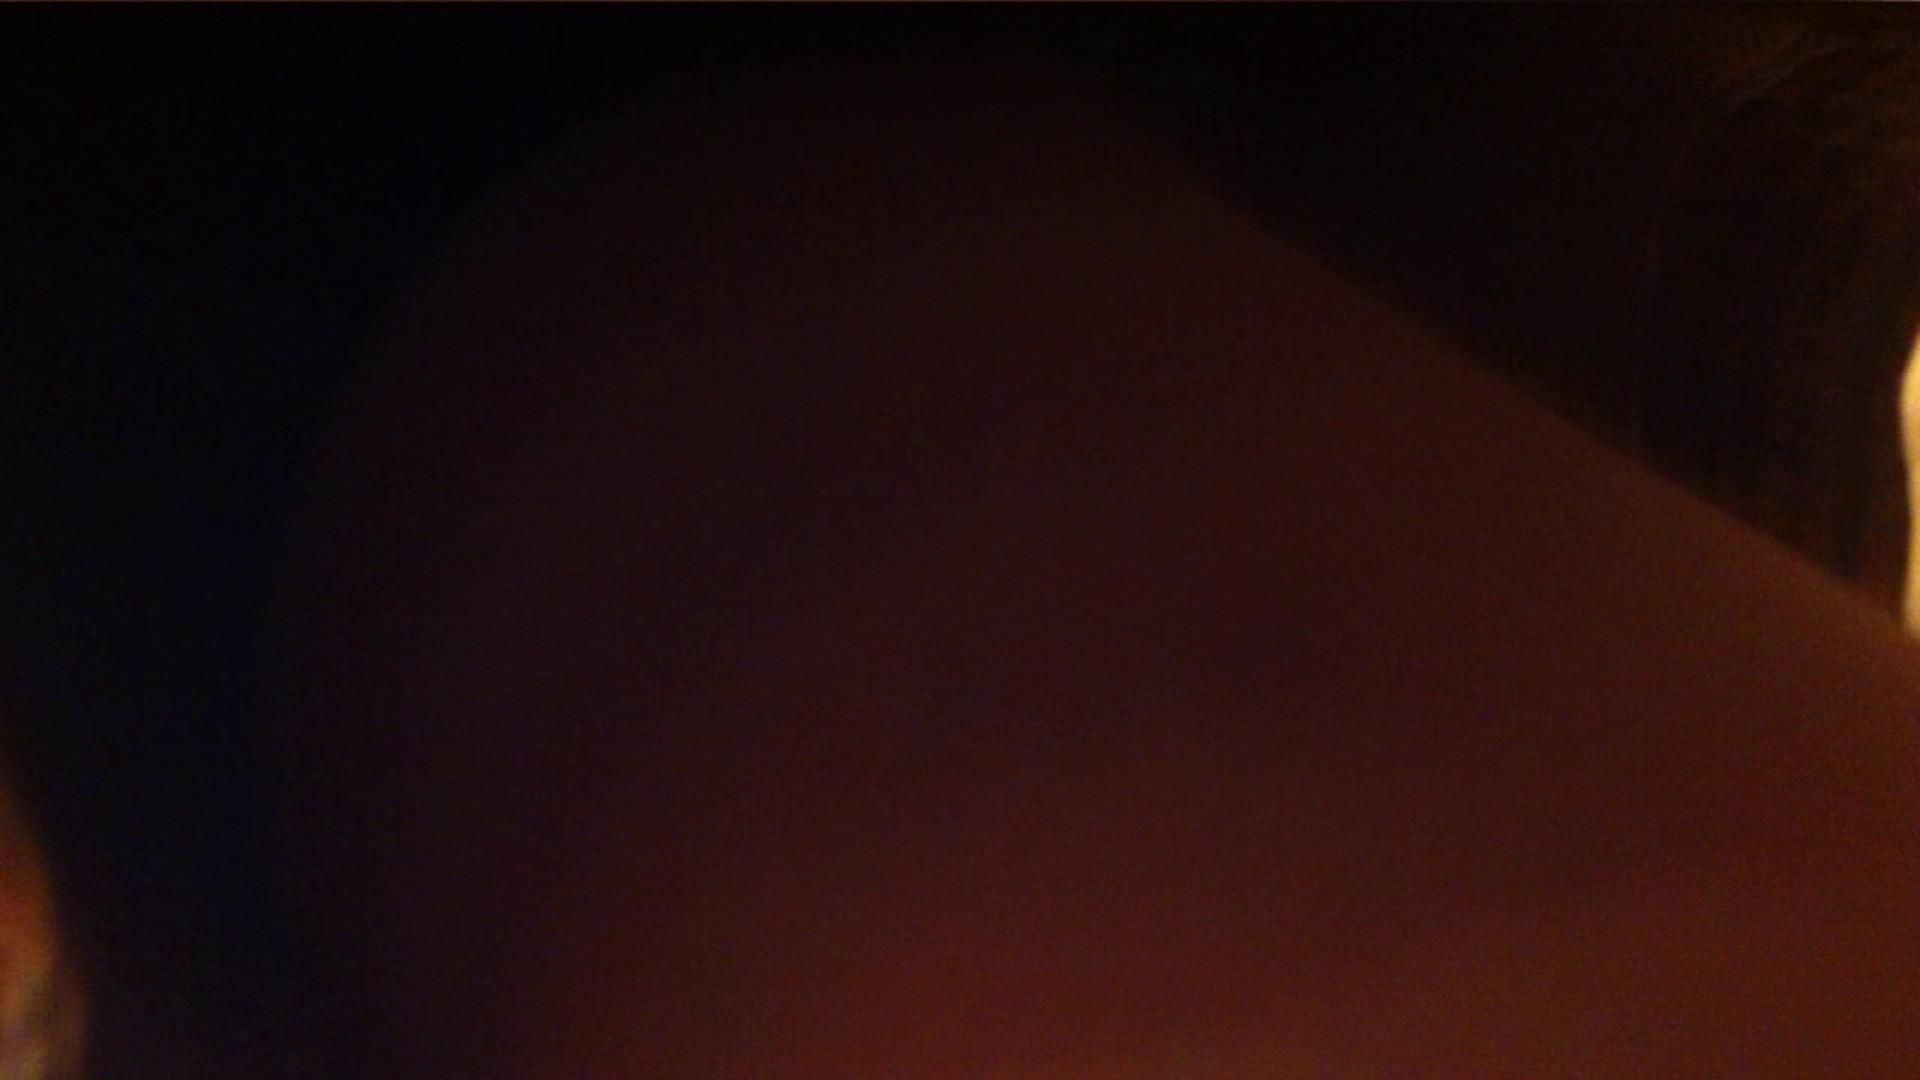 vol.34 美人アパレル胸チラ&パンチラ メガネ属性っていいよね♥ チラ歓迎 戯れ無修正画像 104pic 93